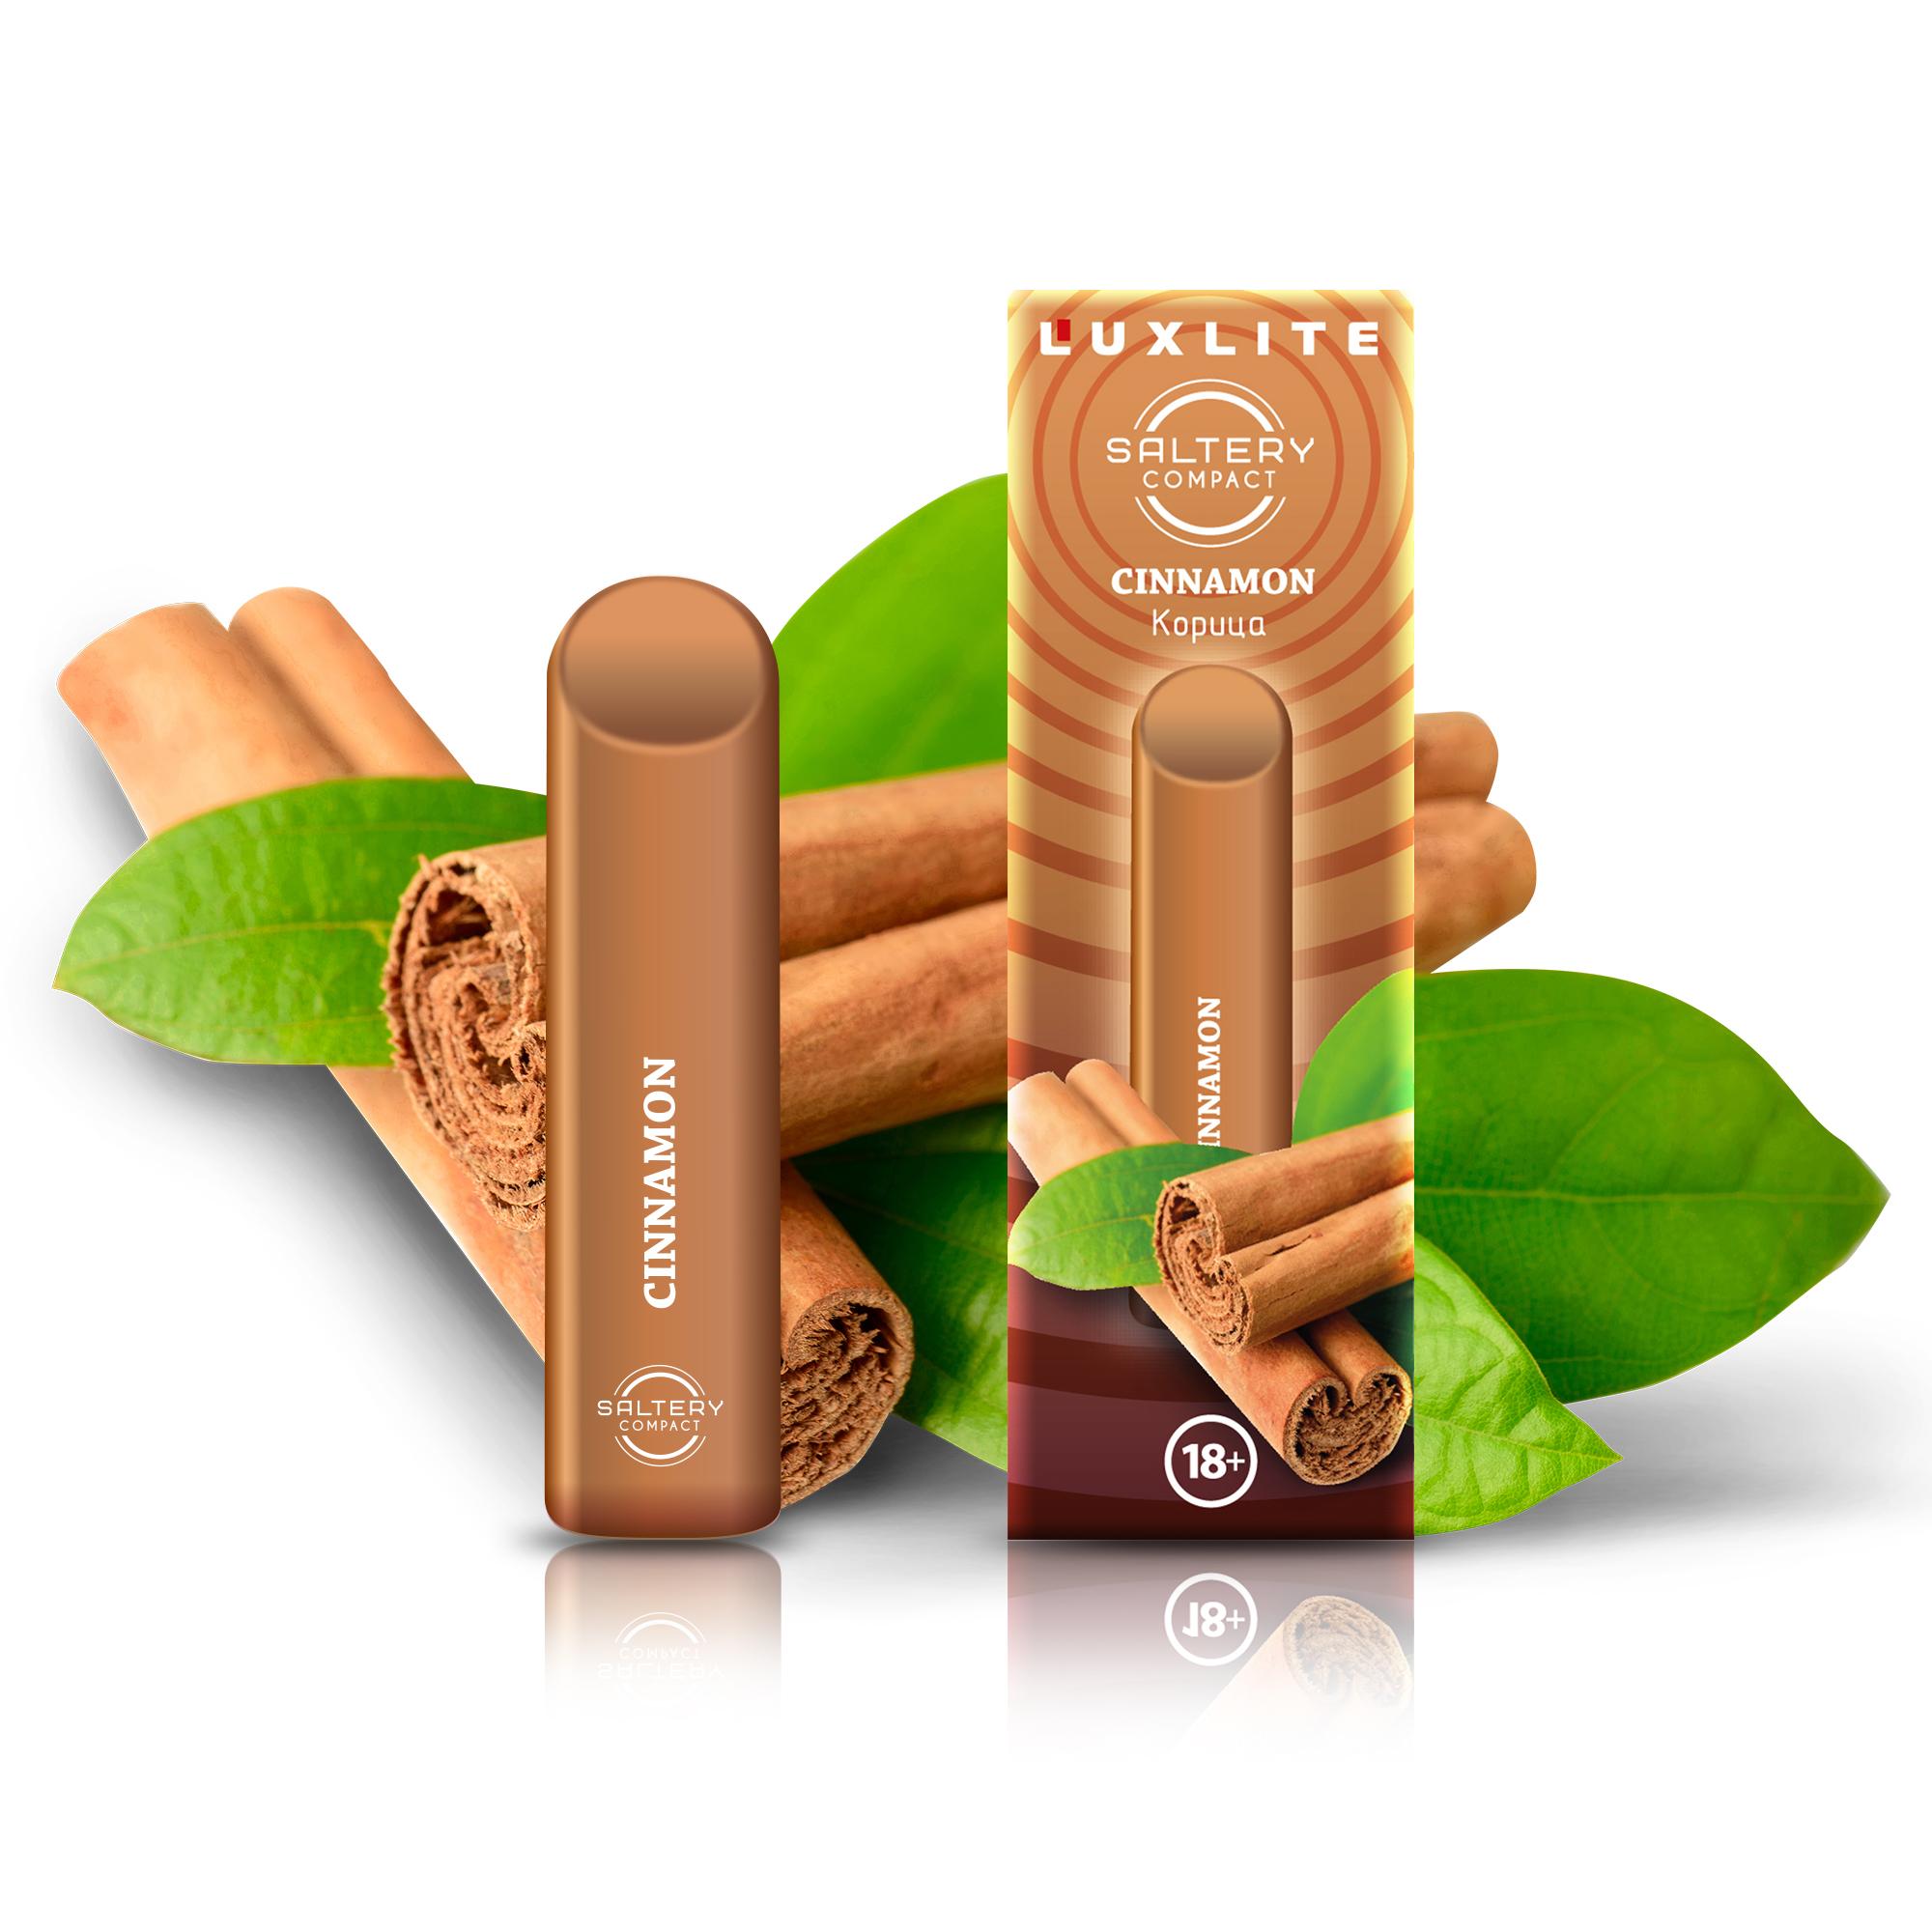 Электронная сигарета Luxlite Saltery Compact со вкусом корицы фото